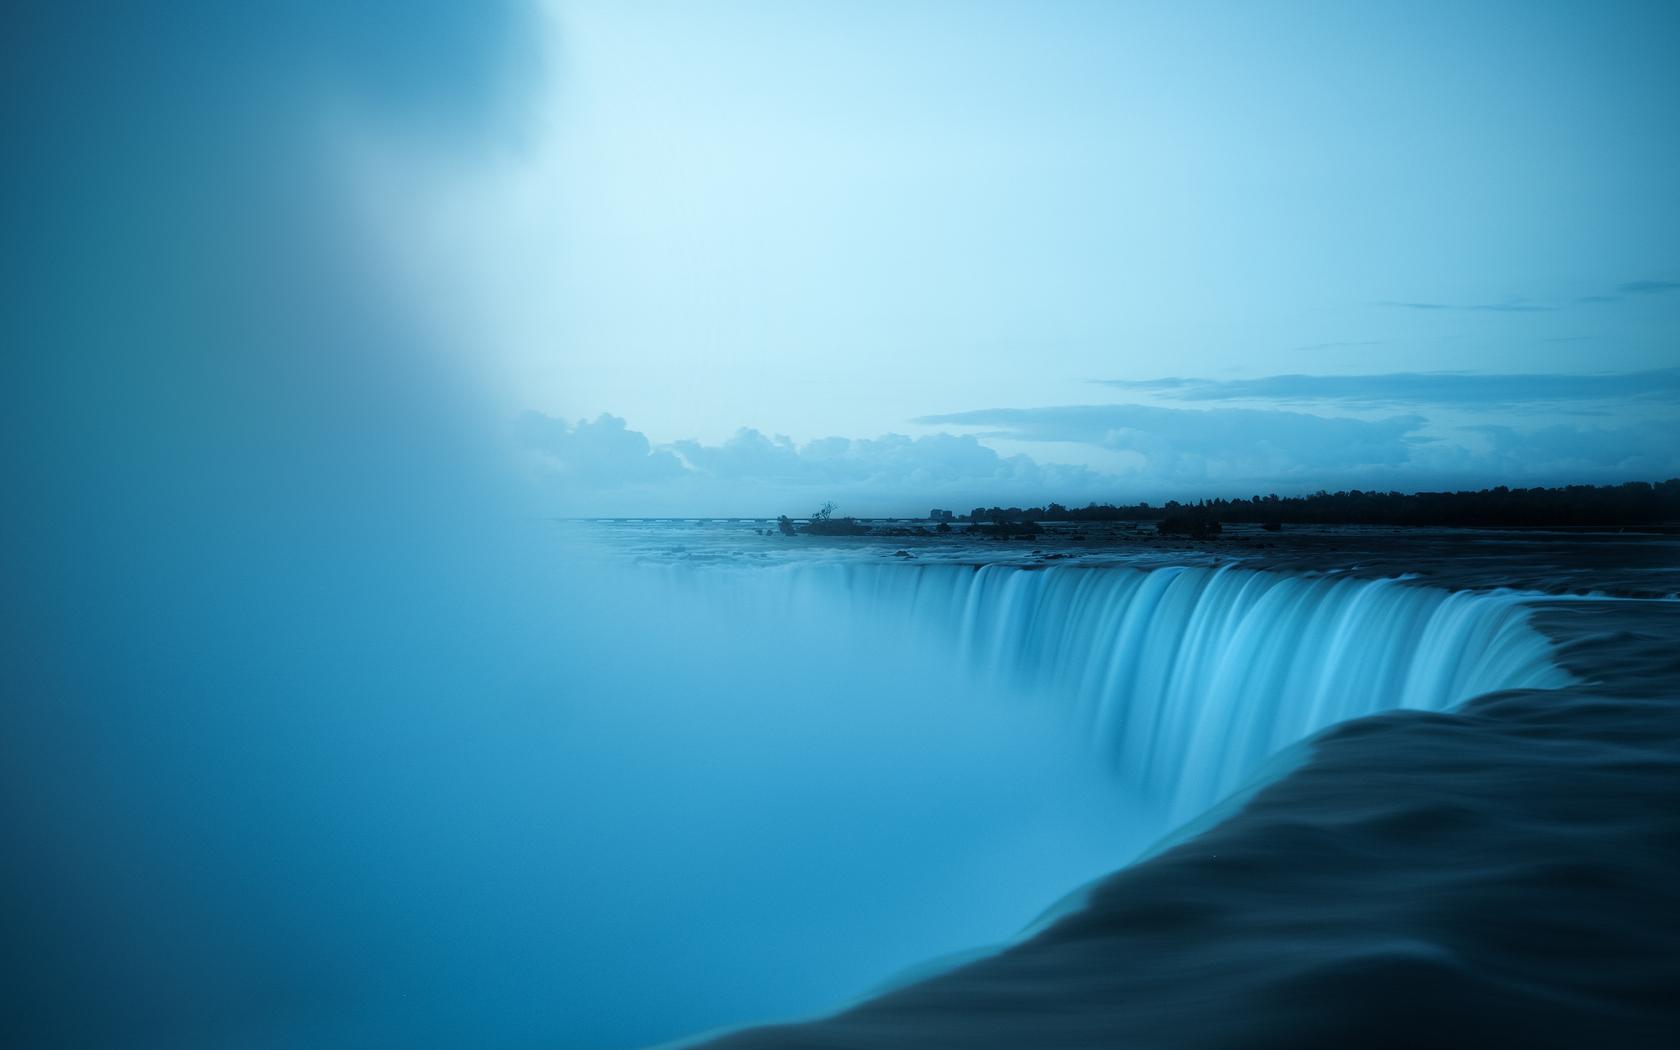 niagara-falls-4k-pb.jpg